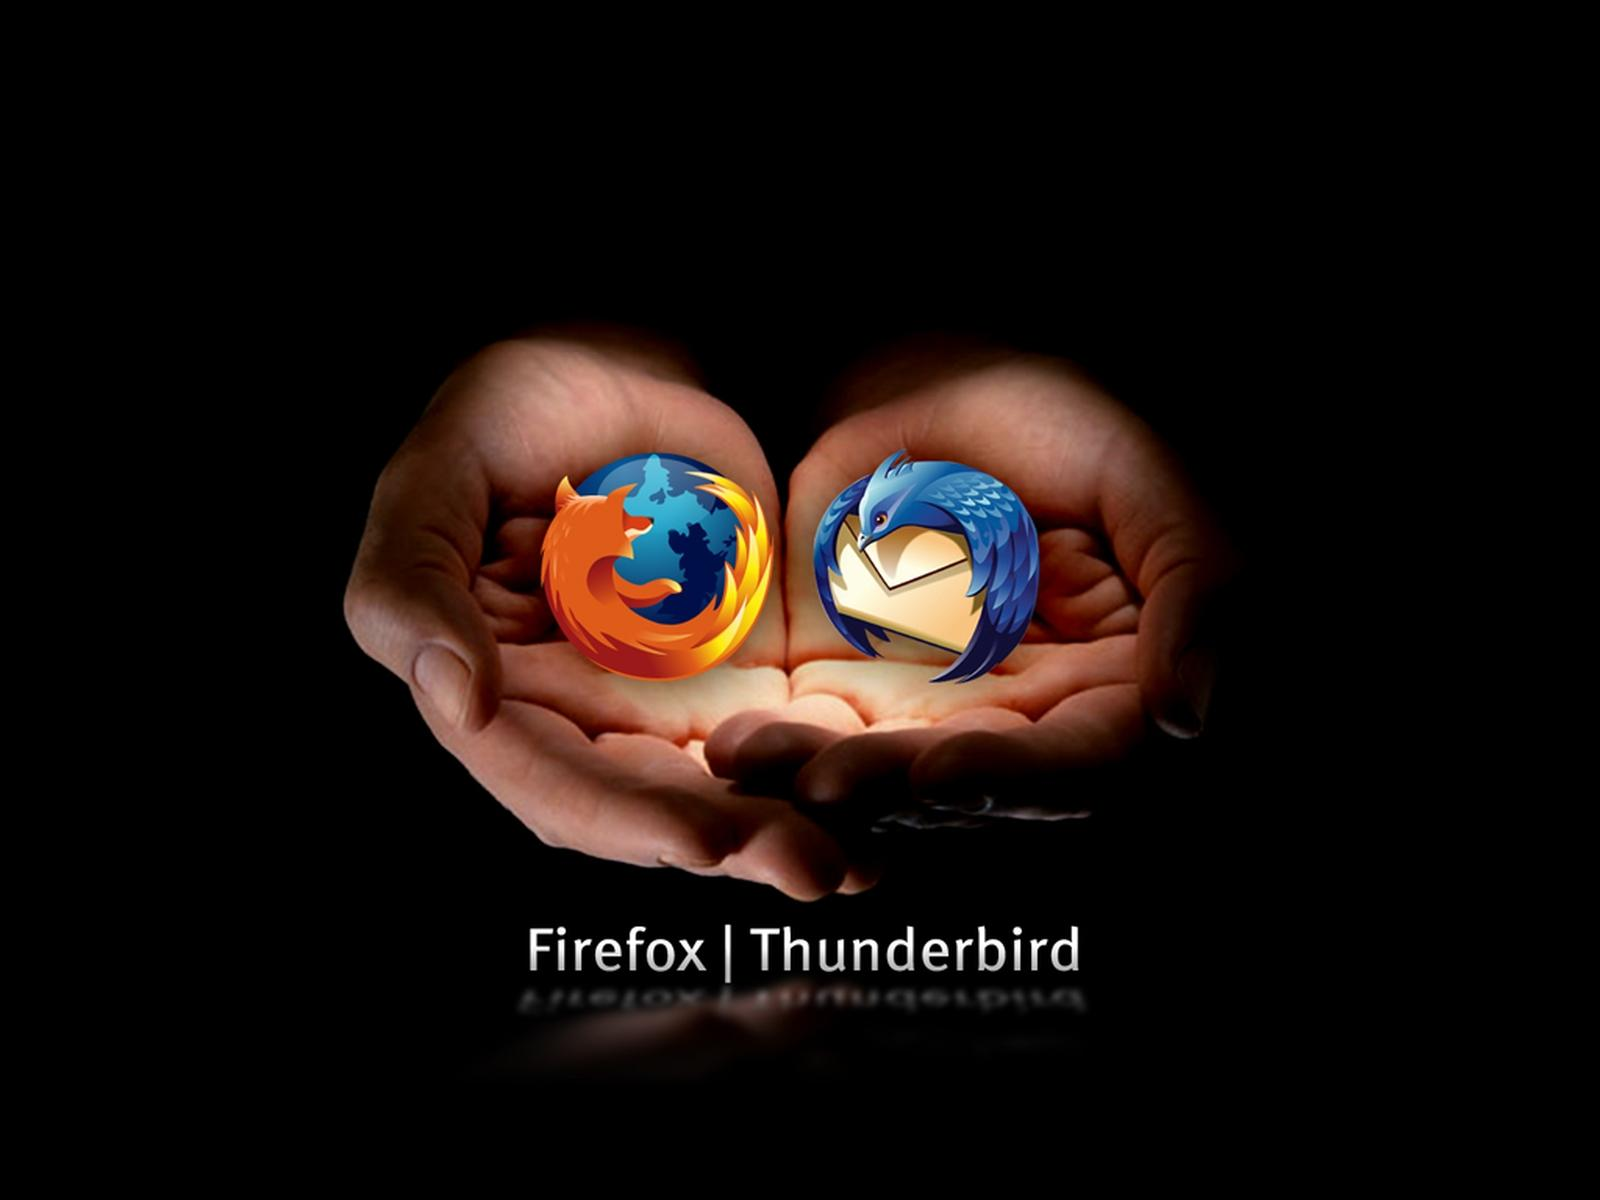 firefox thunderbird in hand